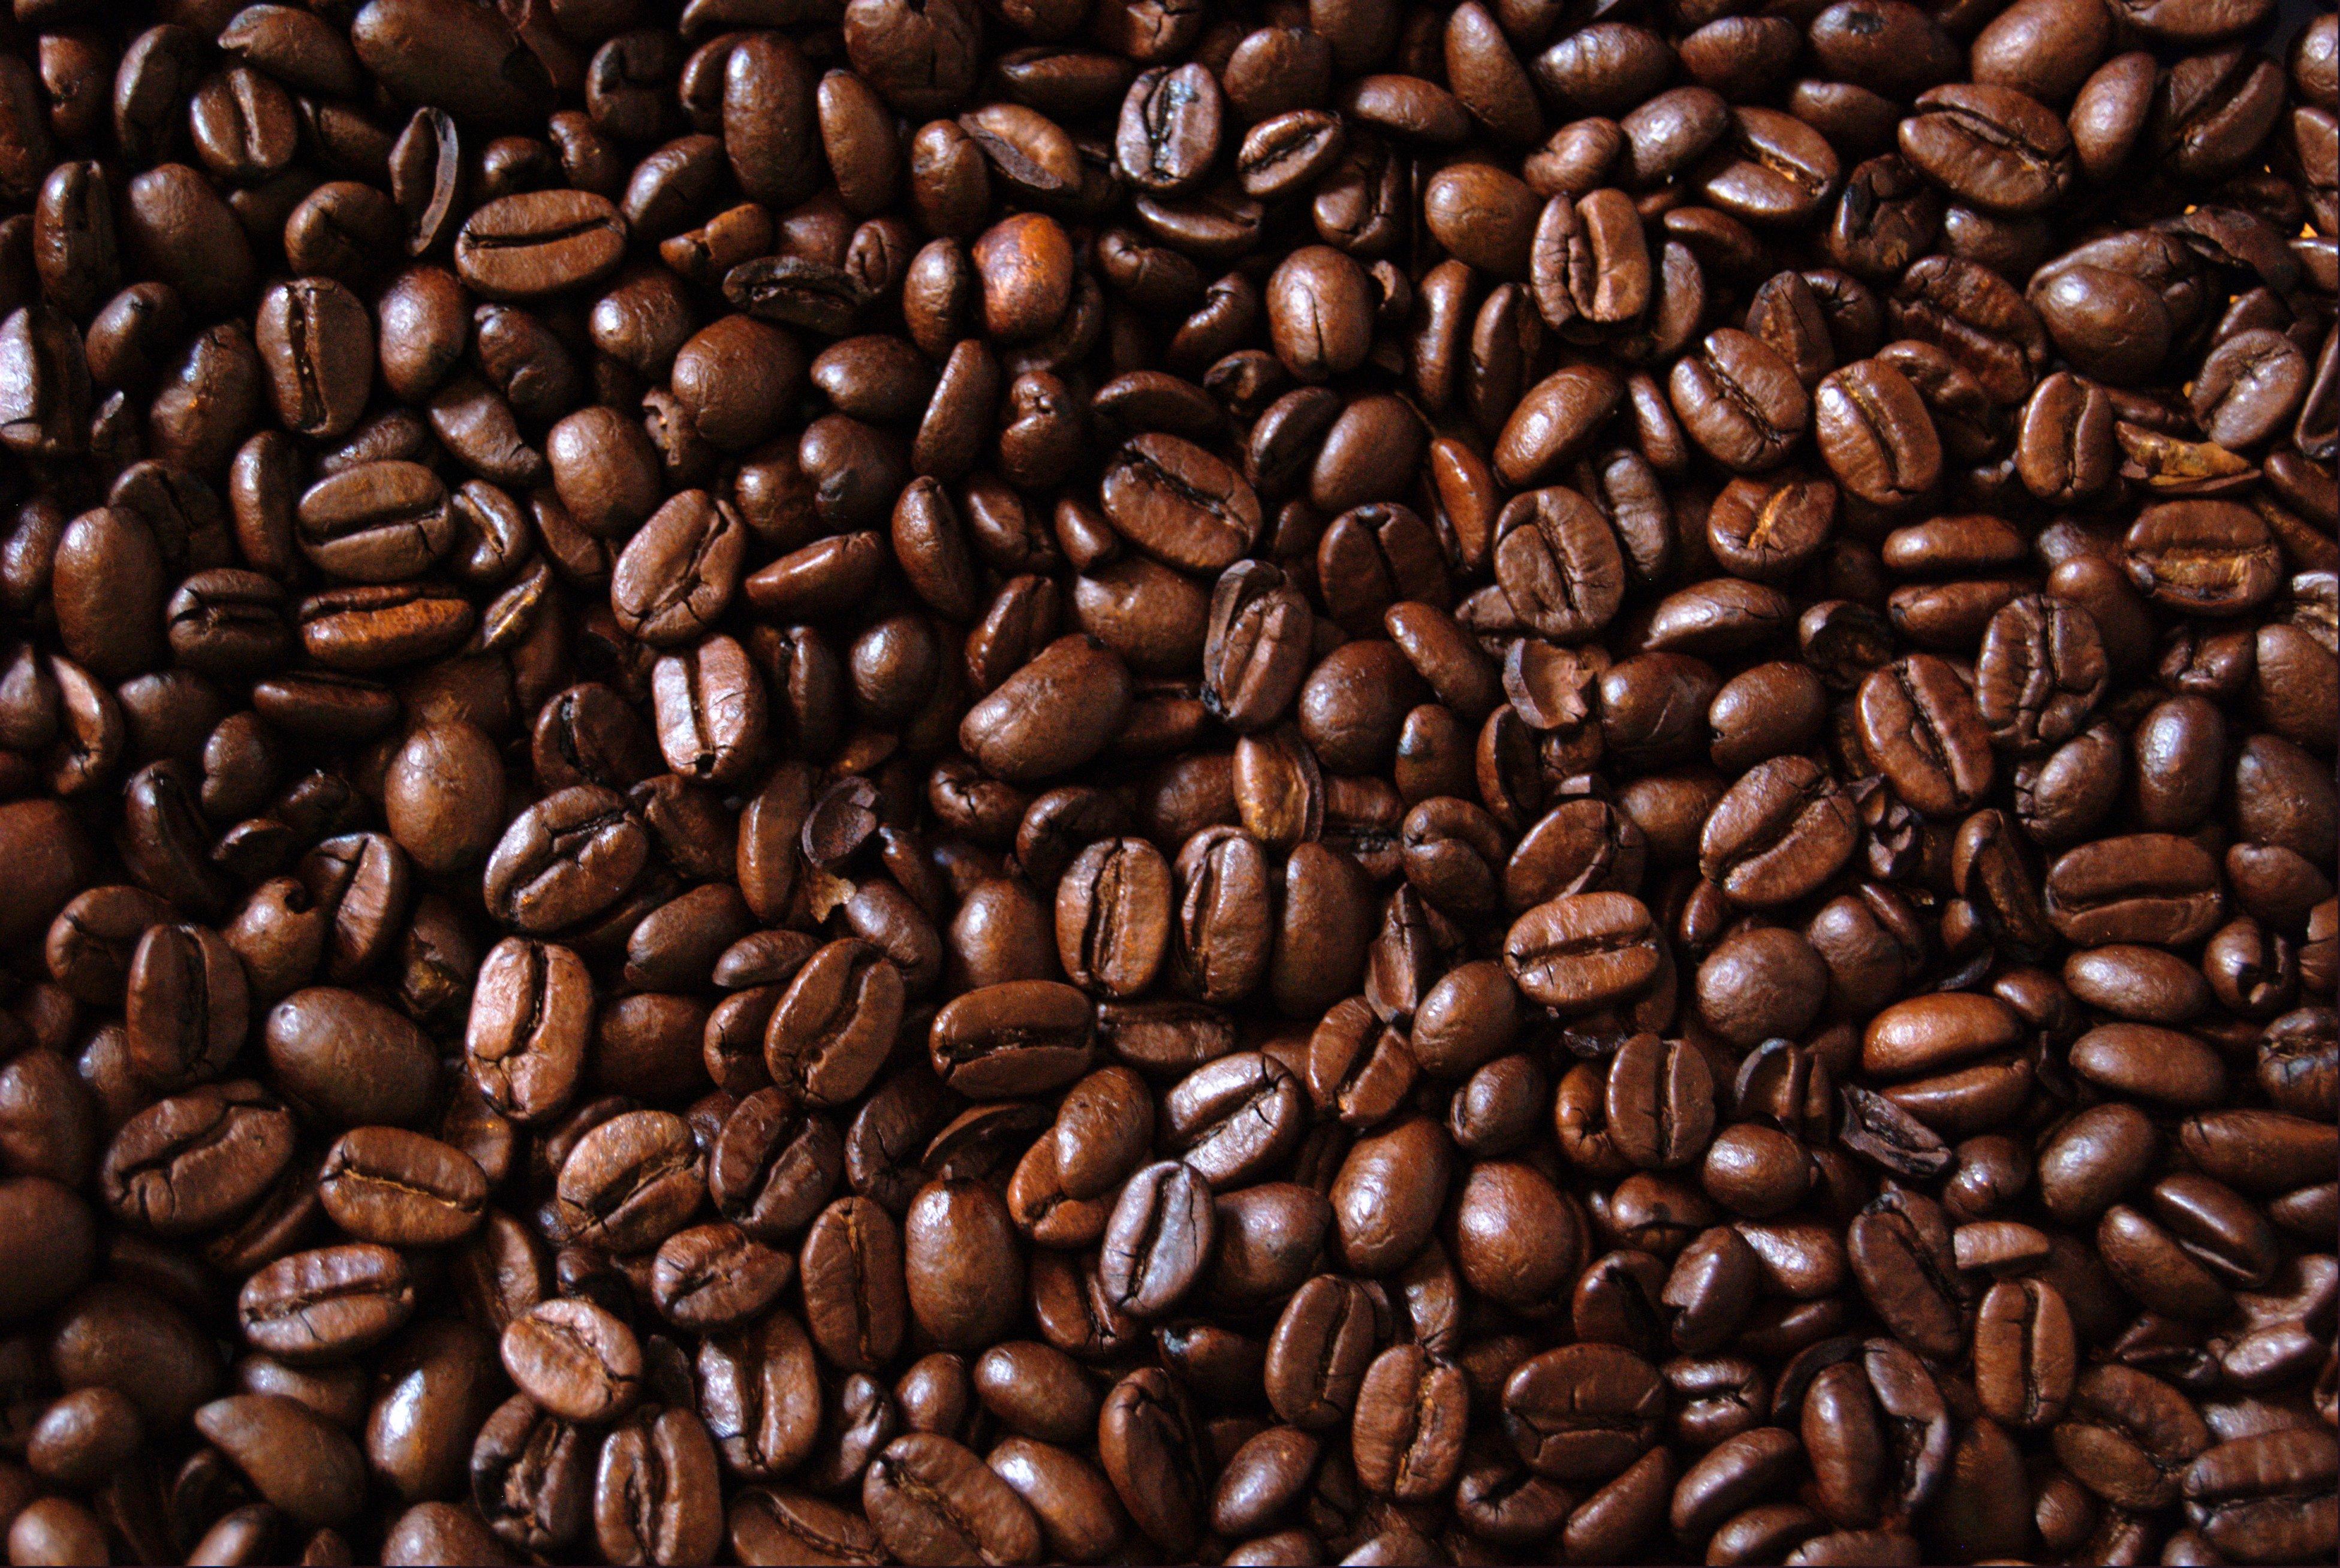 Photo of Ни дня без кофе…заменителя! Ни дня без кофе...заменителя! Ни дня без кофе…заменителя! coffee beans